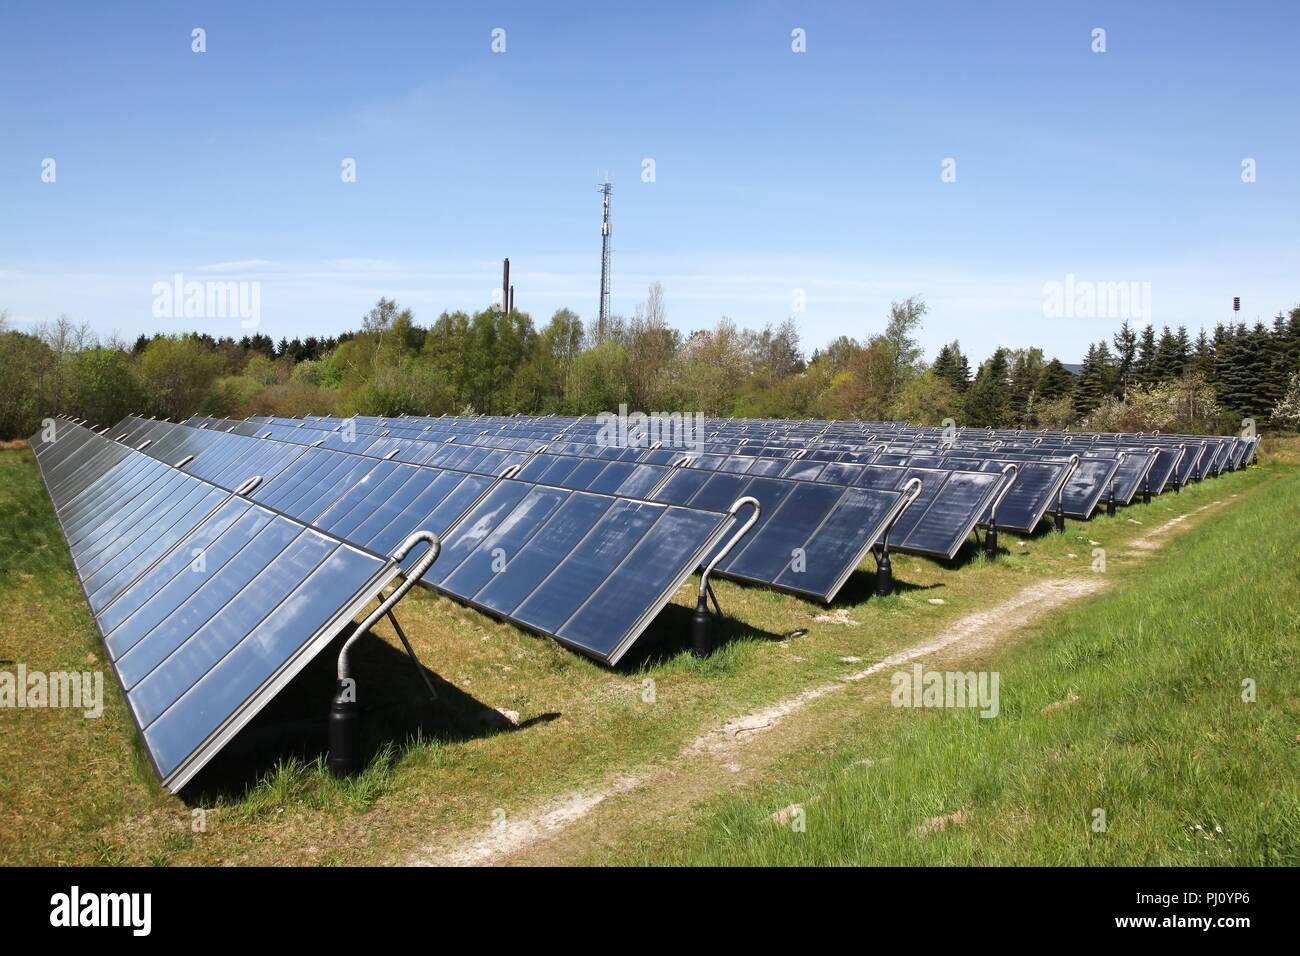 Grupo de paneles de energía solar térmica en Dinamarca Imagen De Stock